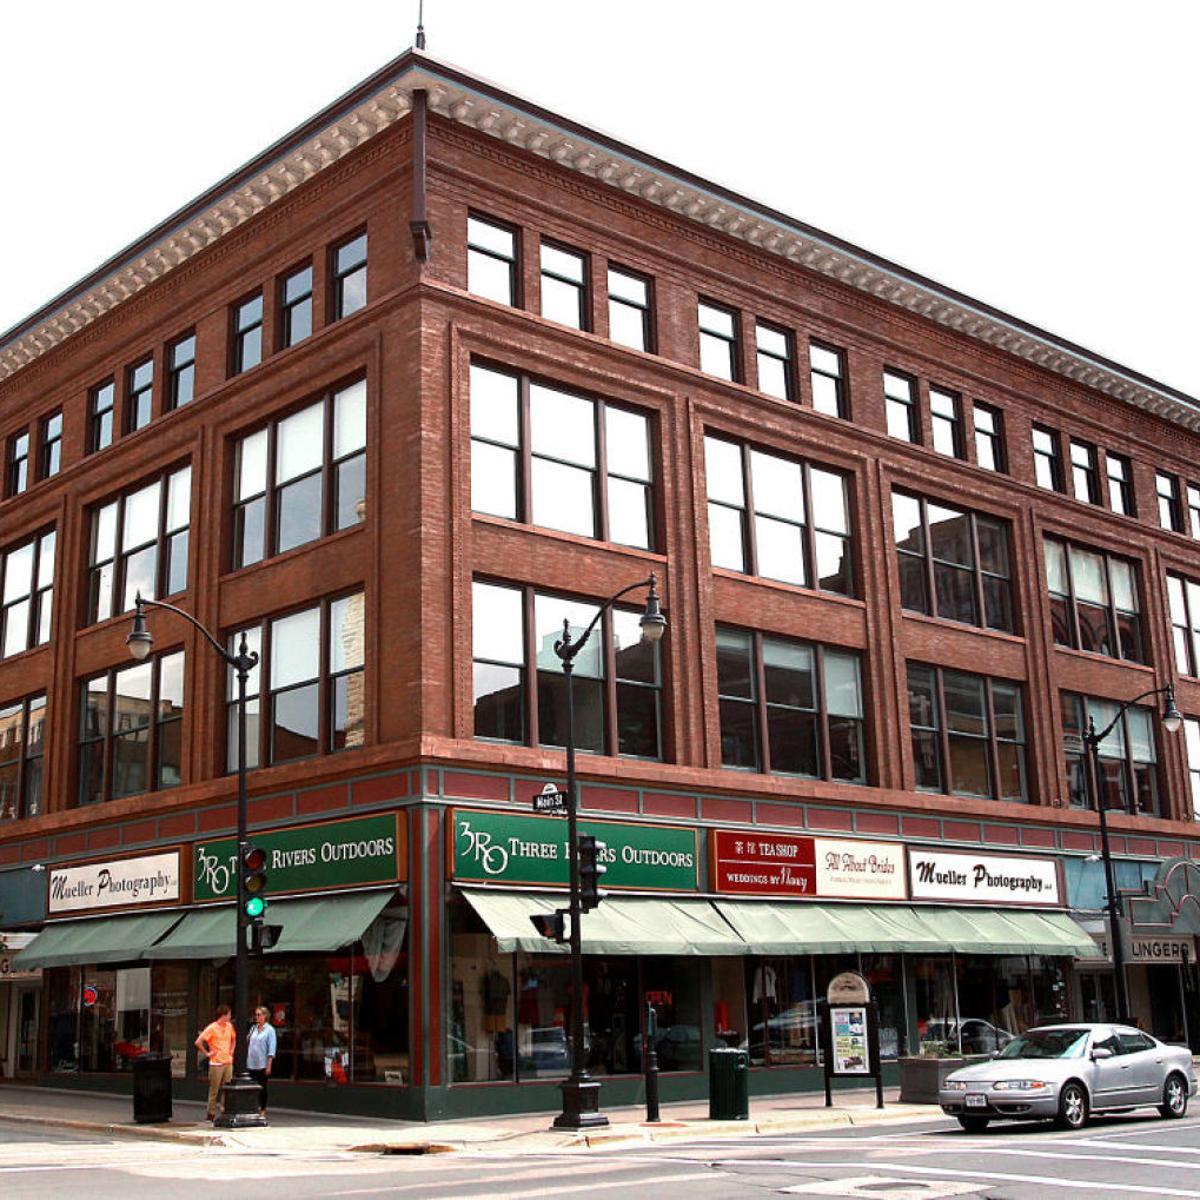 Duluth Trading Co To Open In Doerflinger Building Local News Lacrossetribune Com